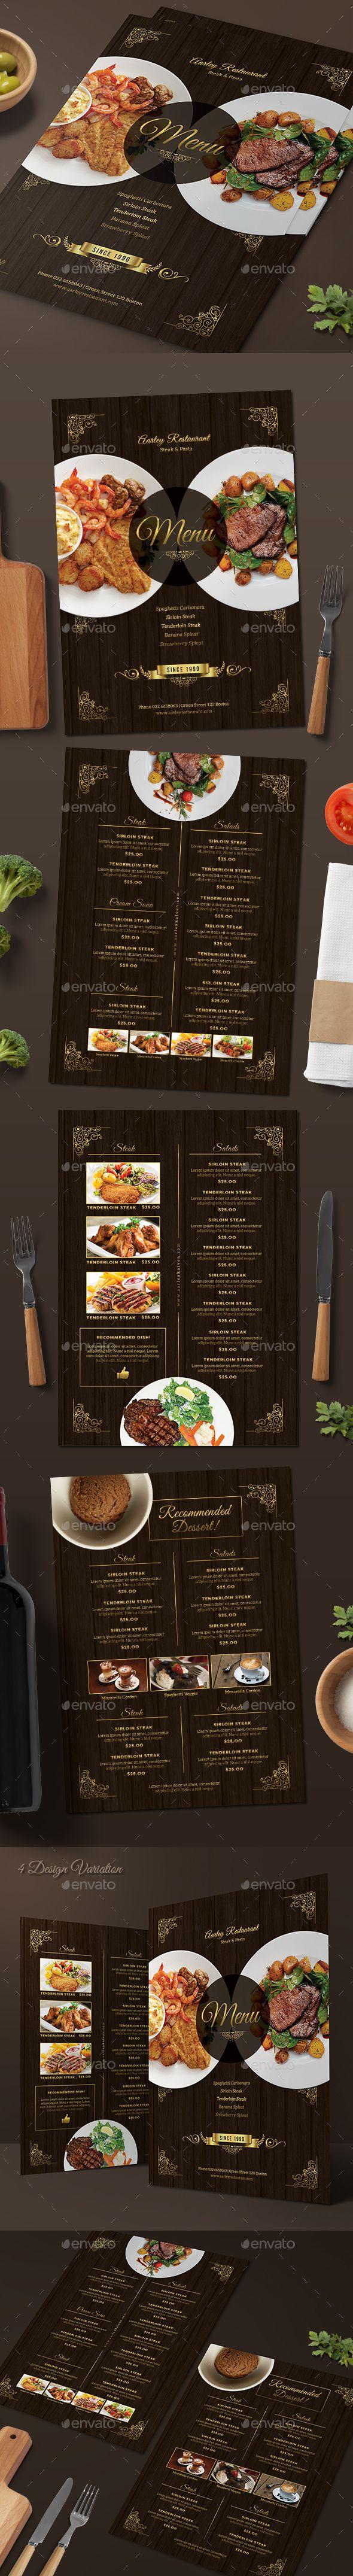 Elegant Restaurant Menu - Food Menus Print Templates | Download: https://graphicriver.net/item/elegant-restaurant-menu/18590107?ref=sinzo